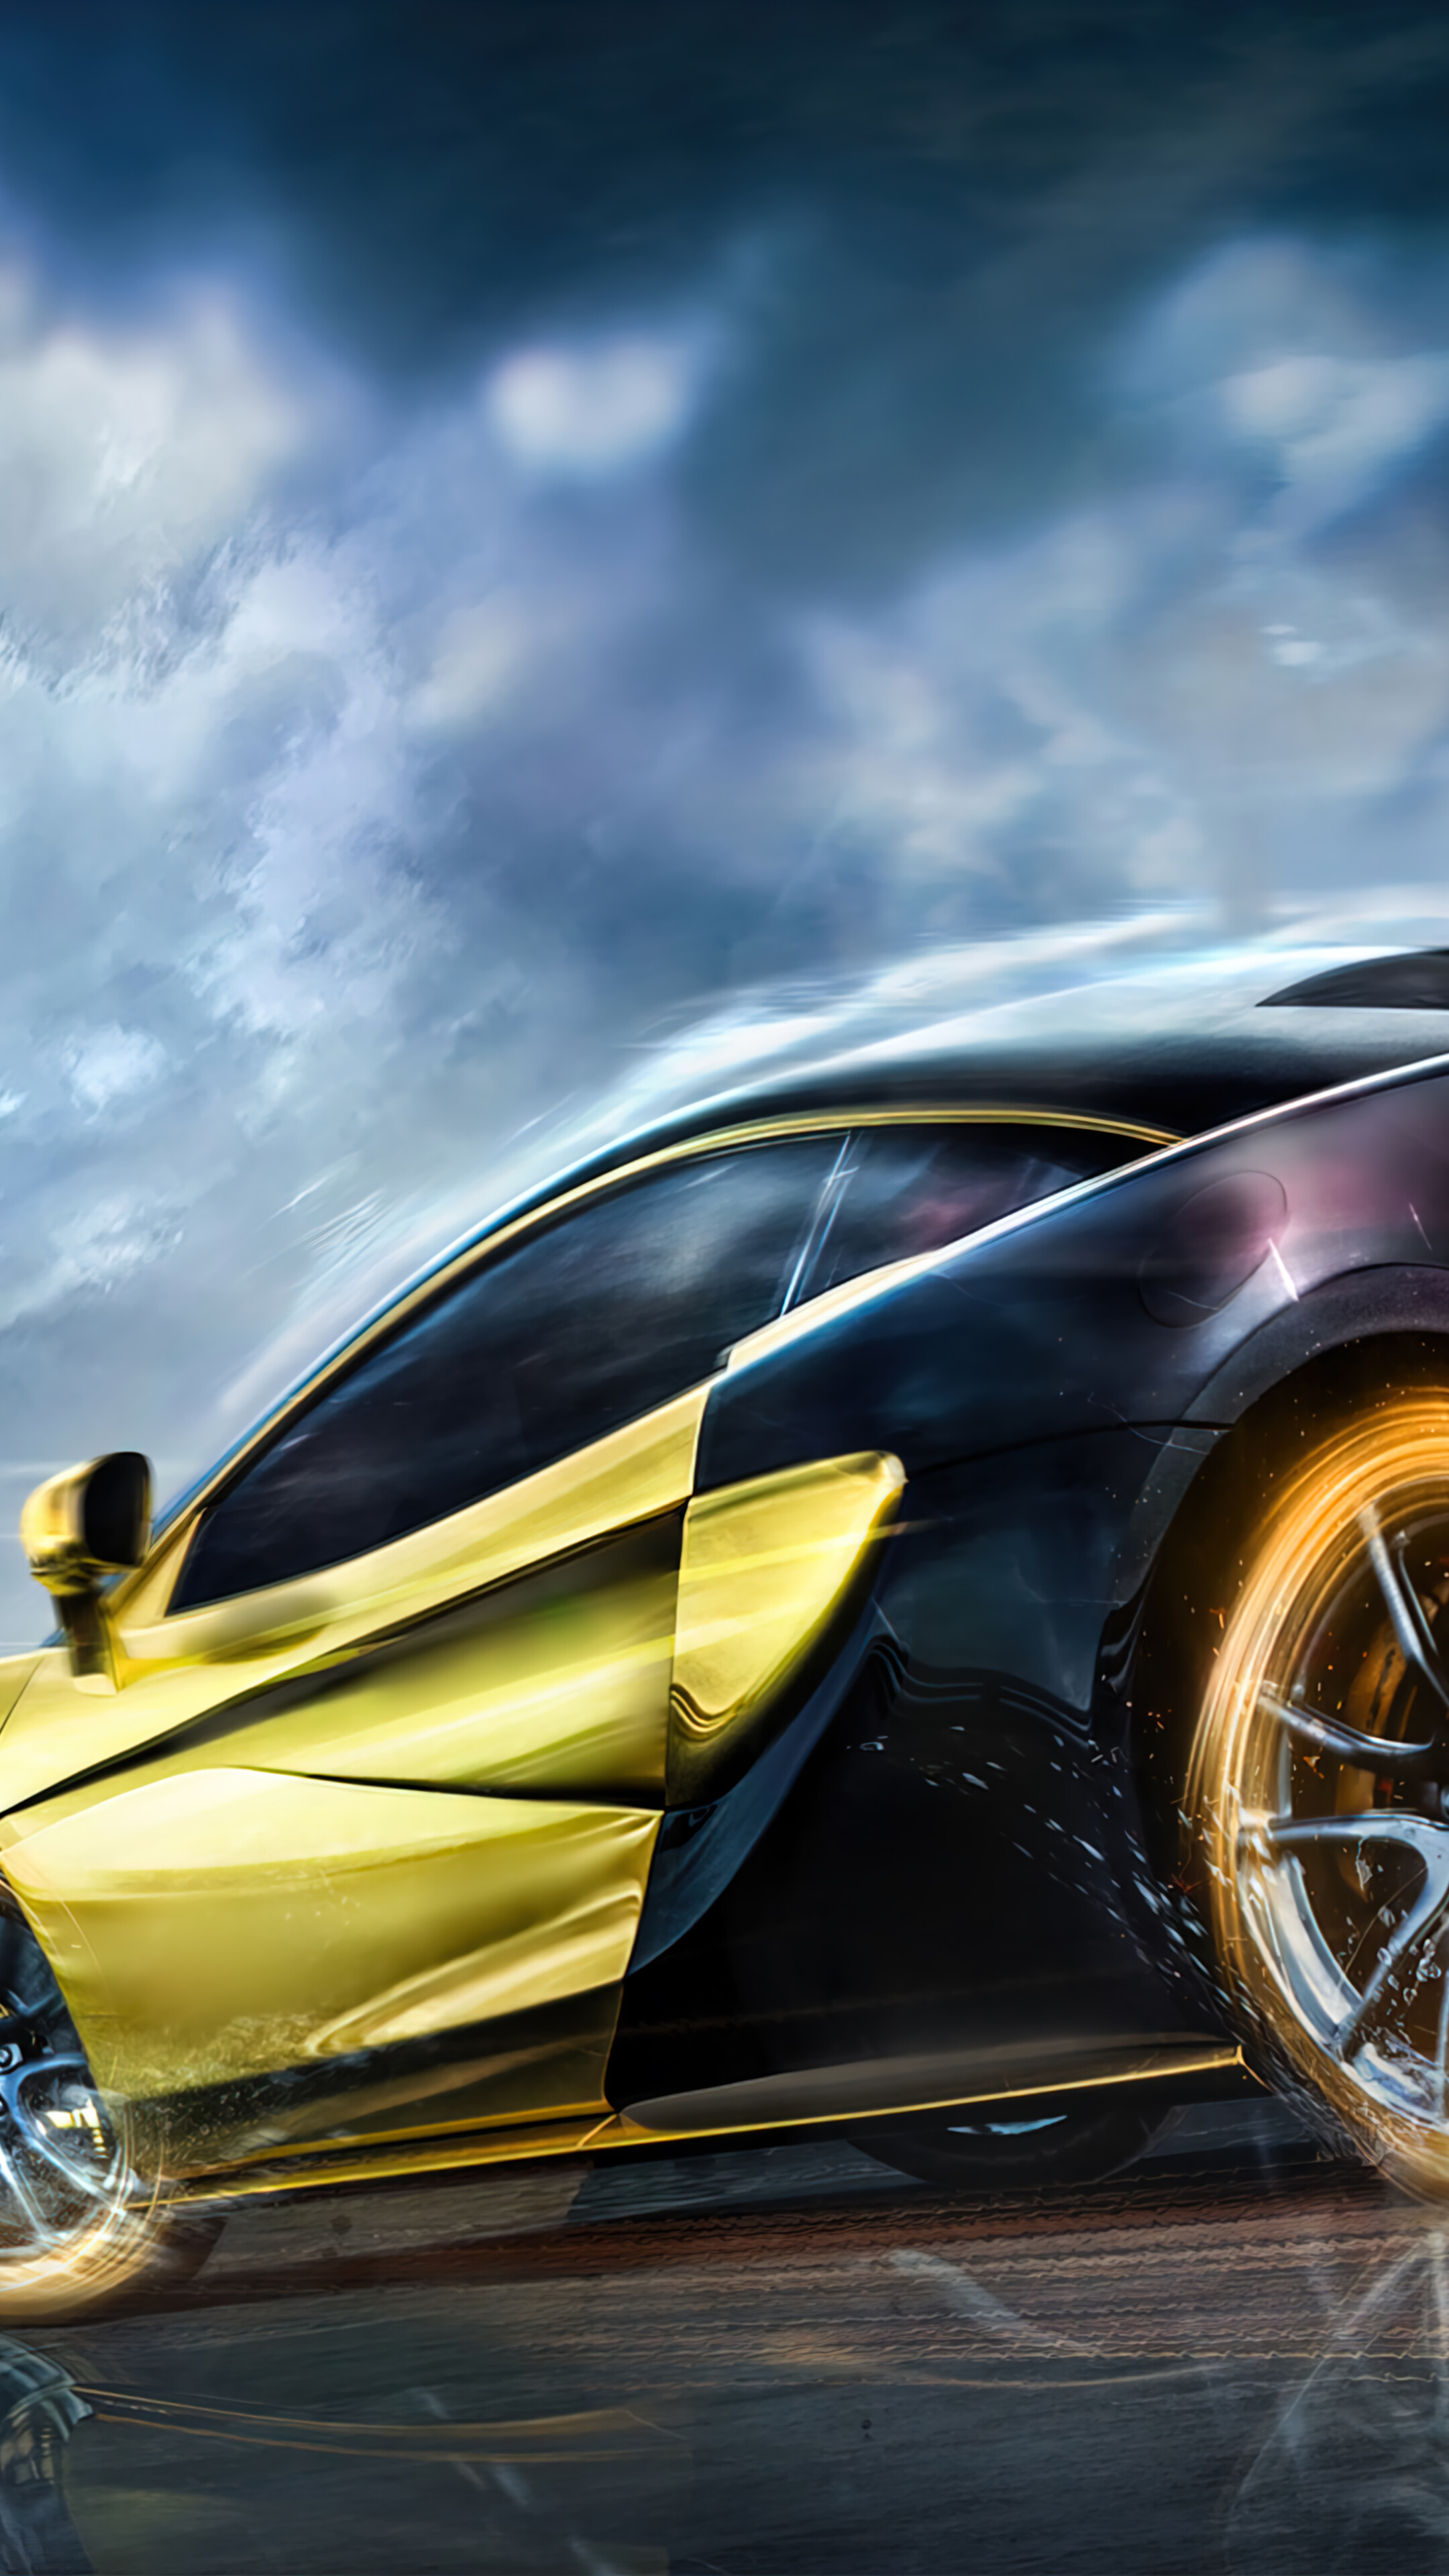 Choose from hundreds of free mustang wallpapers. Pubg Mobile Gold Mclaren Sports Car Wallpaper 4k Pc Desktop 7670a